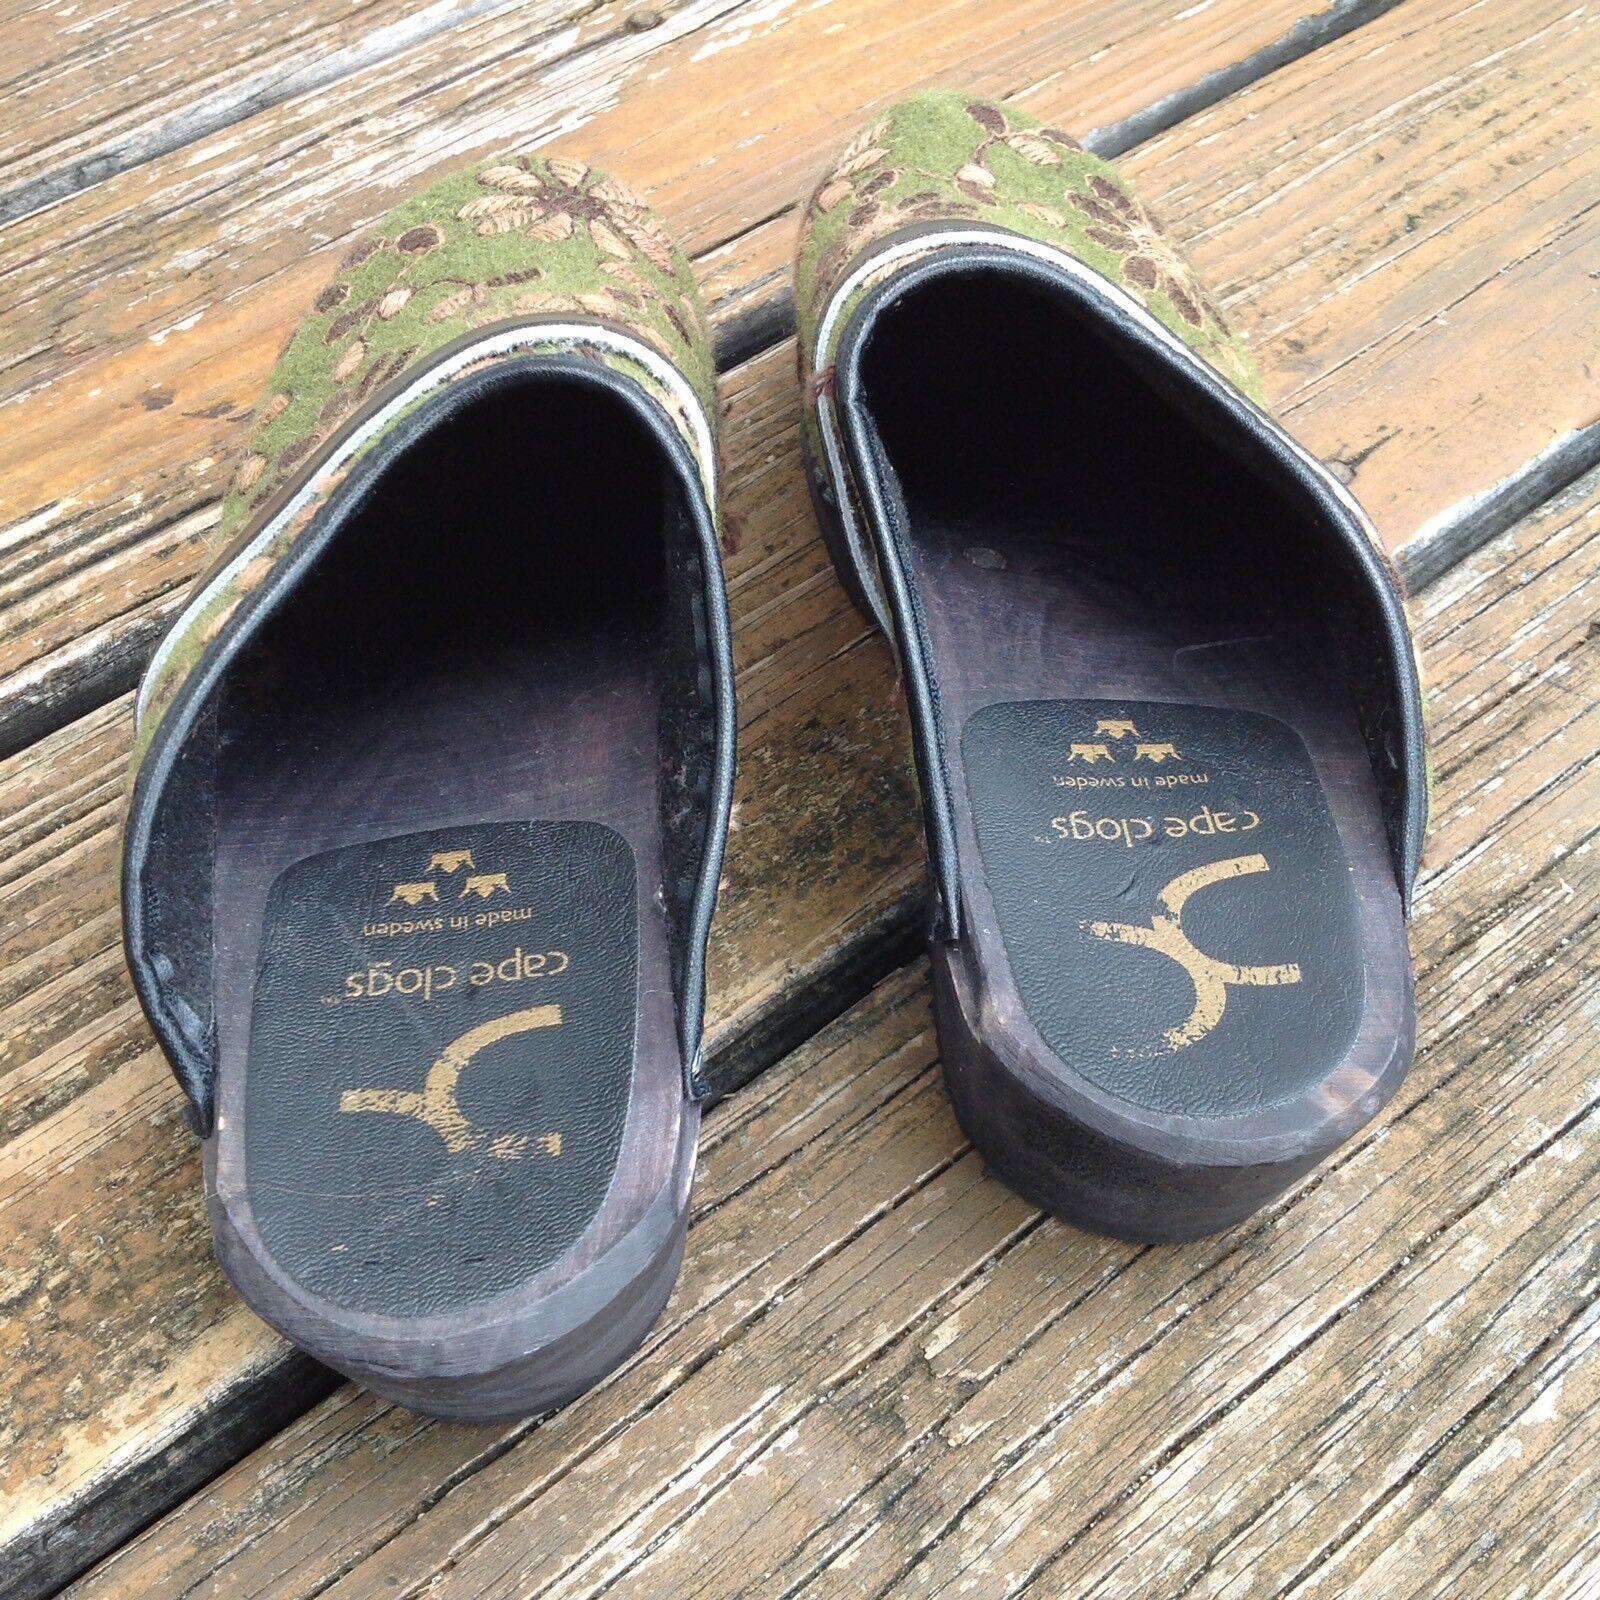 Cape Clogs Wool Grün Grün Wool Yellow Floral Slip On Schuhes Damenschuhe 8.5 9 EUR 39 Nurse 303ce0